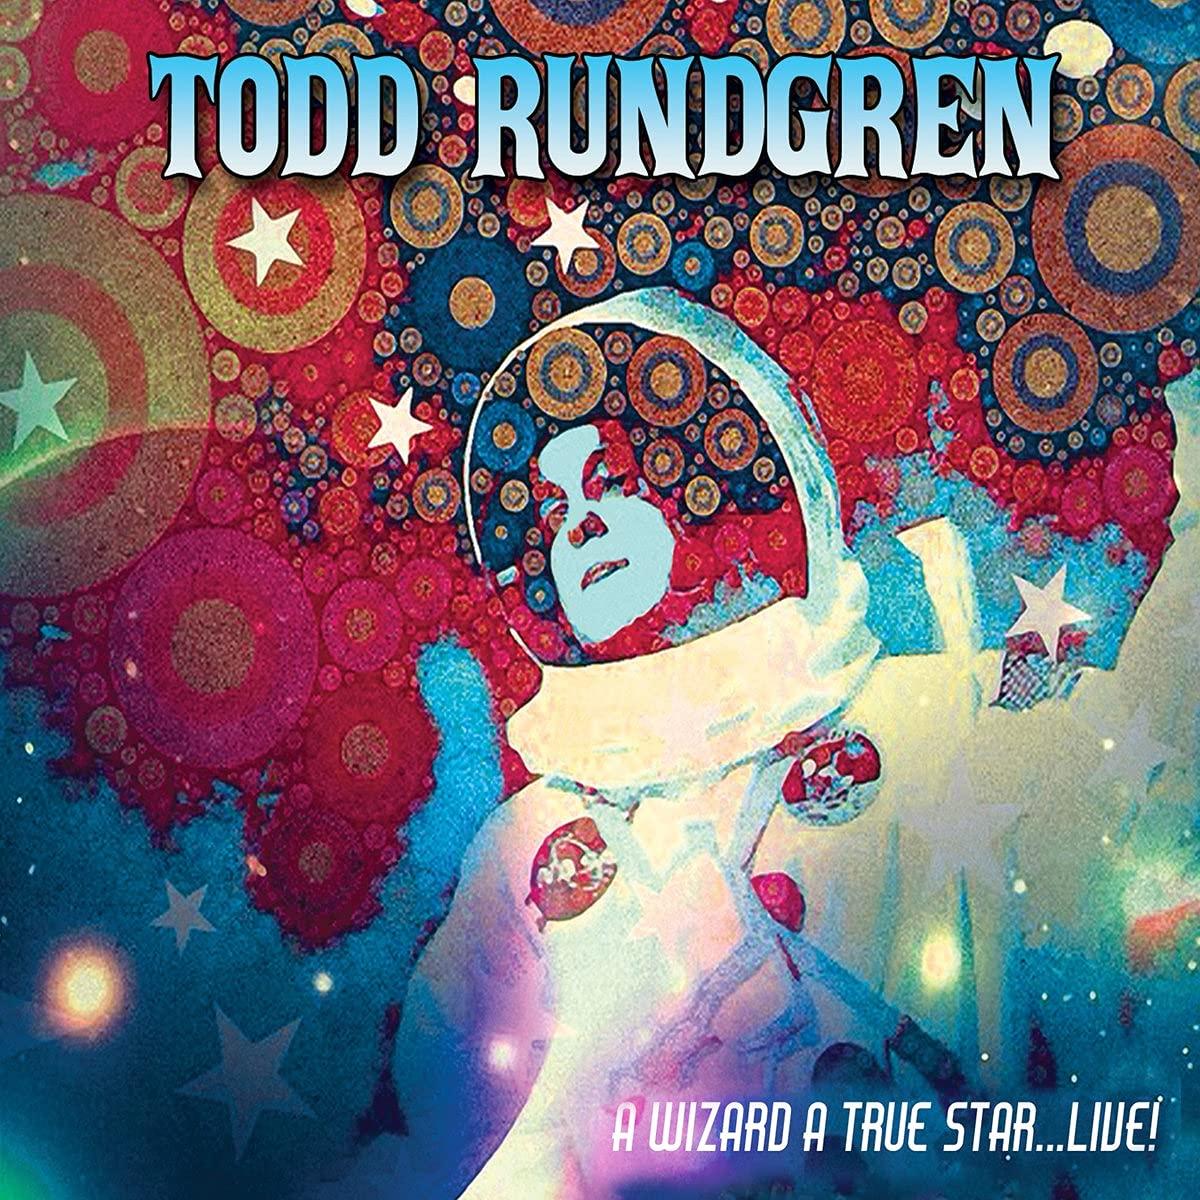 Todd Rundgren - A Wizard A True Star... Live! (2020) [FLAC] Download